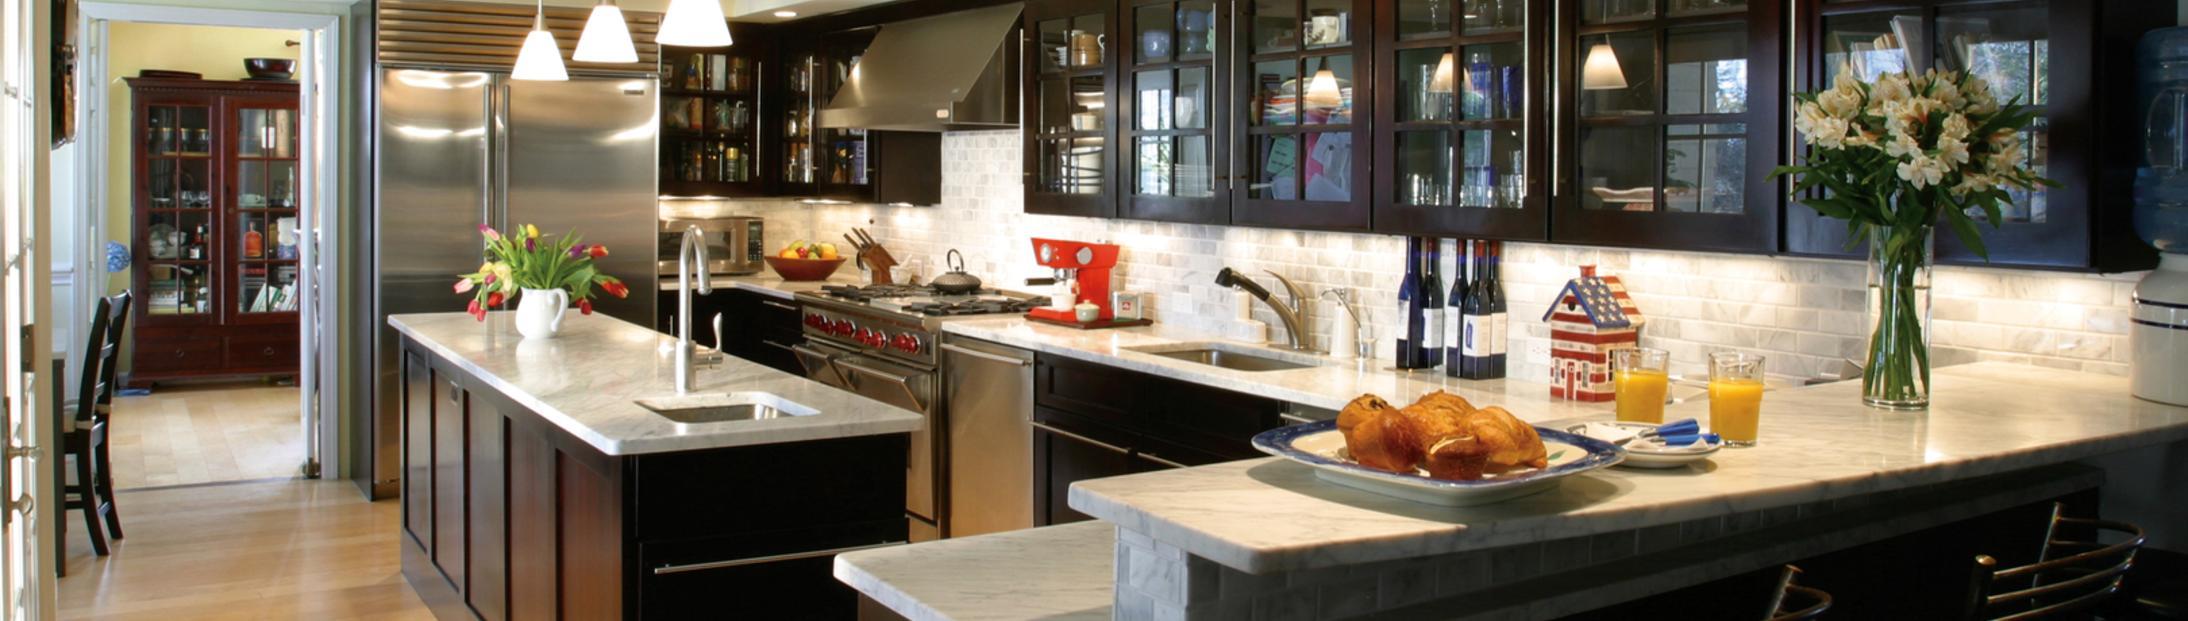 Interior Elements Kitchen Cabinets Countertops